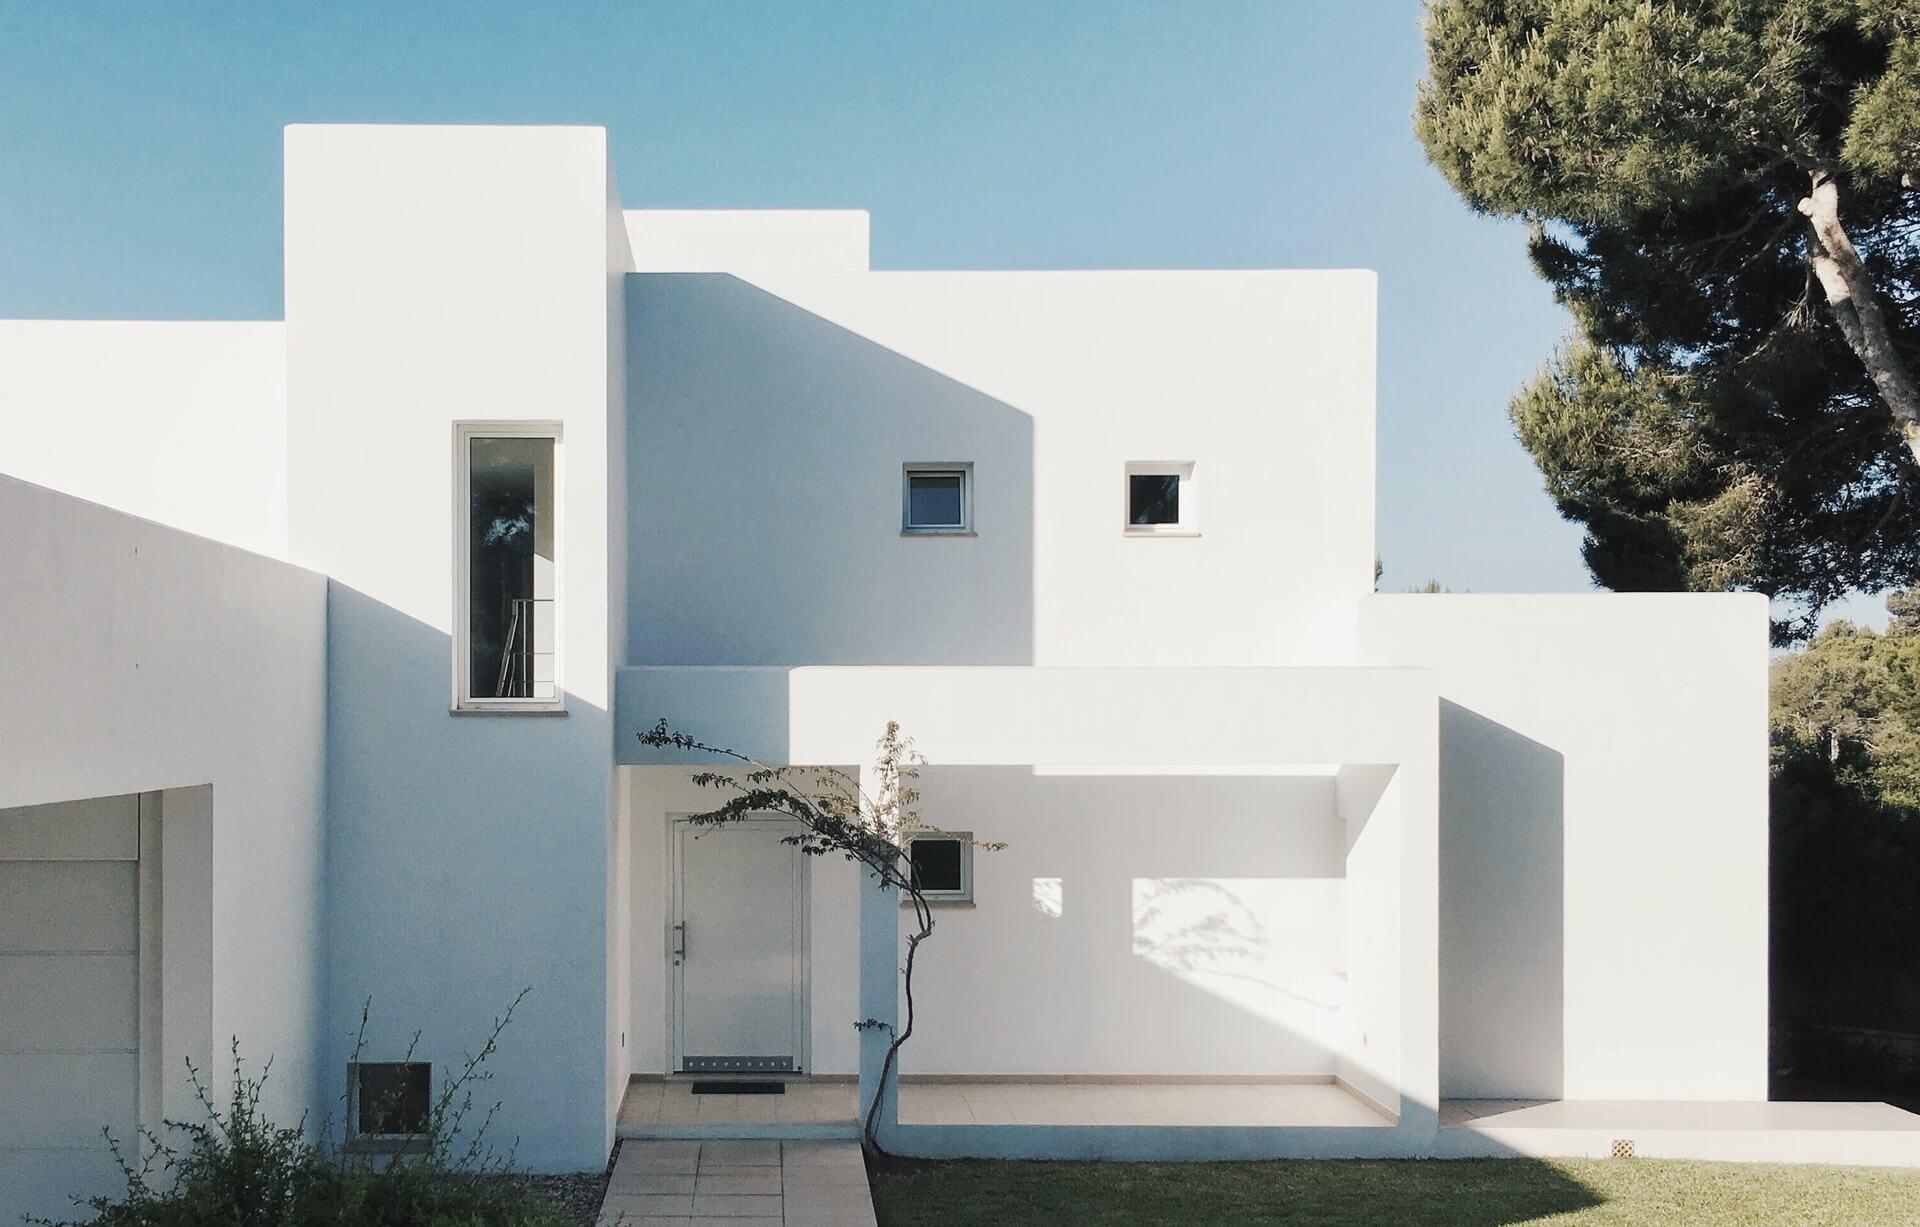 La importancia de la arquitectura sostenible